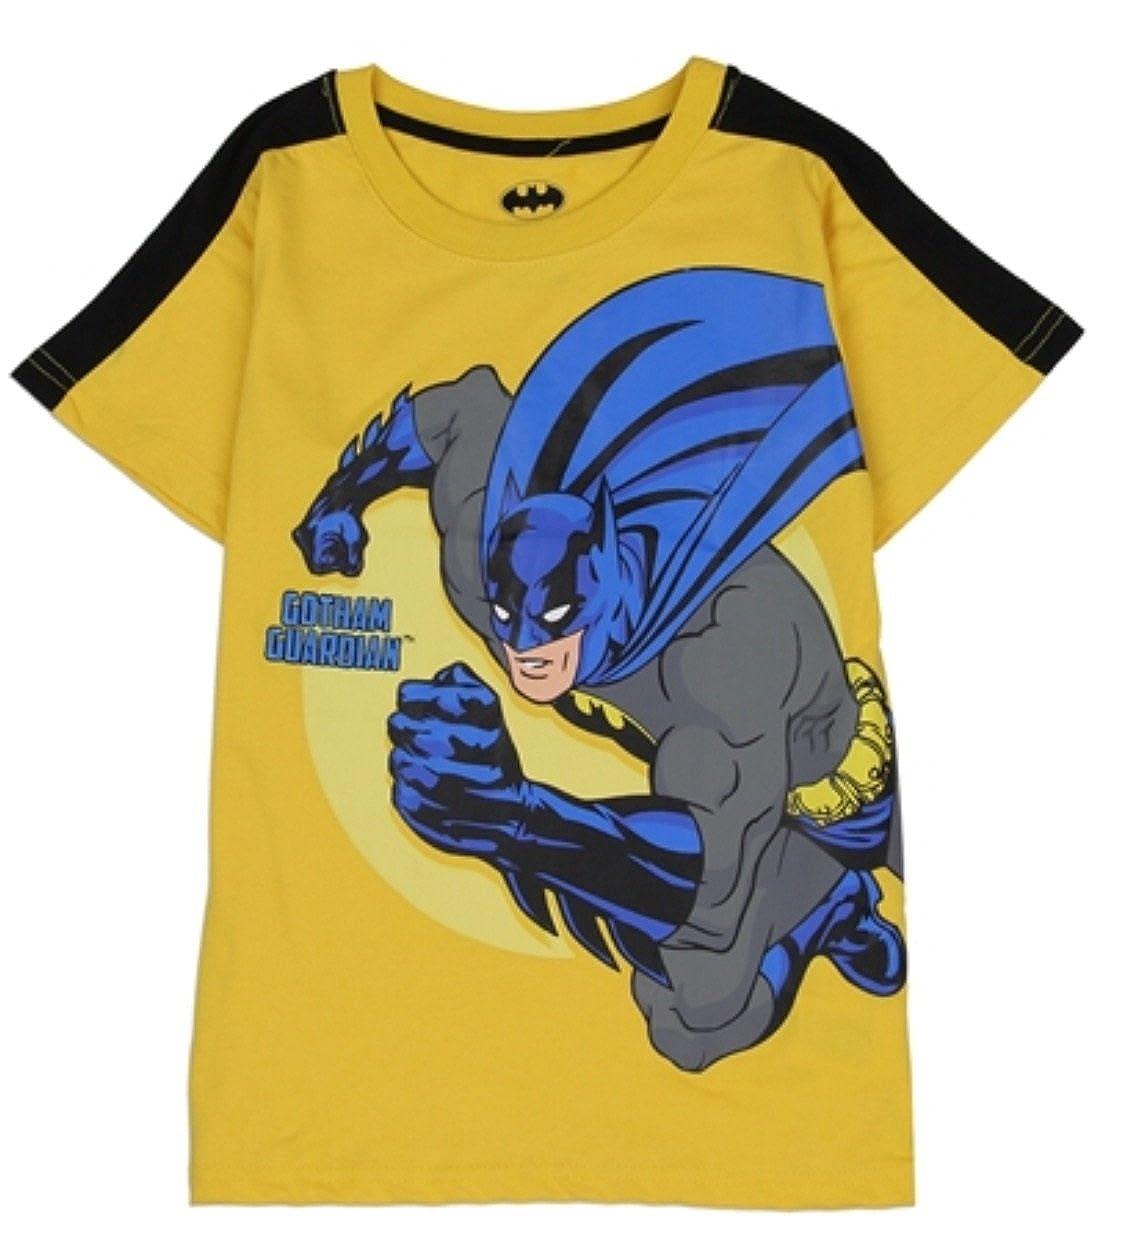 435c53b6 Amazon.com: Comics DC Batman Toddler Little Boys Gotham Guardian T-Shirt  (2T): Clothing